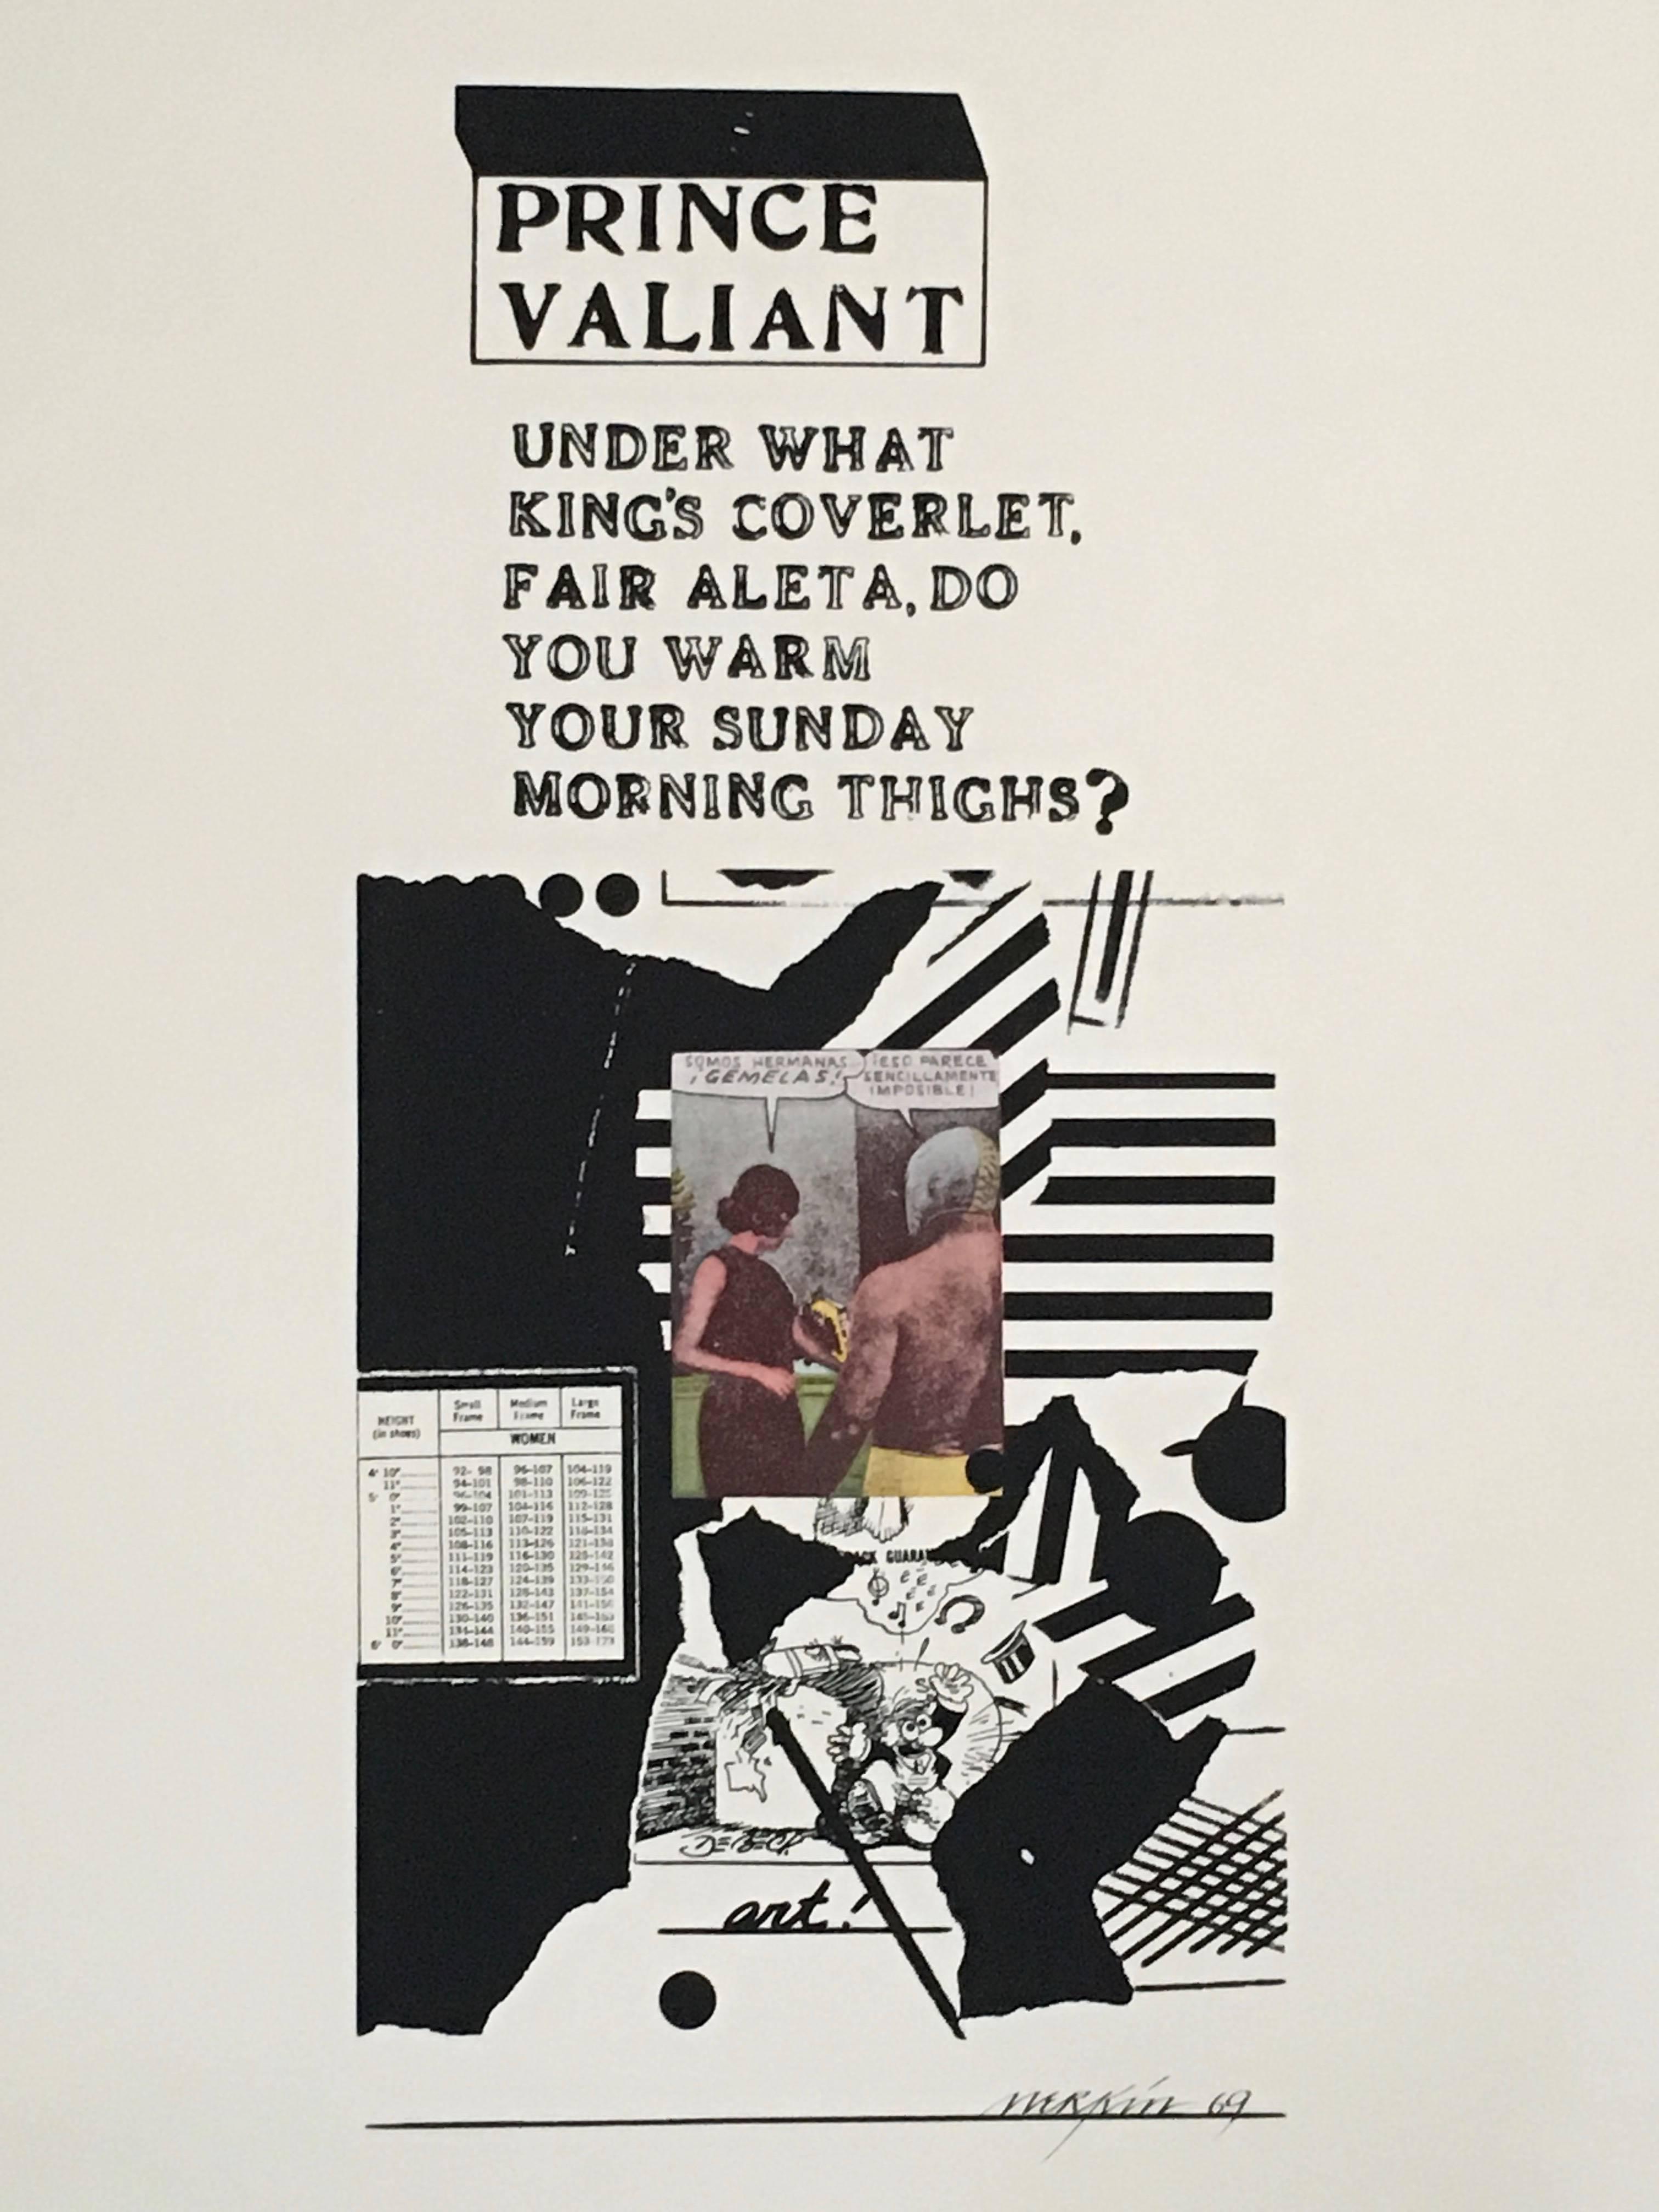 Prince Valiant Pop Art 1969 Color Screenprint Richard Merkin